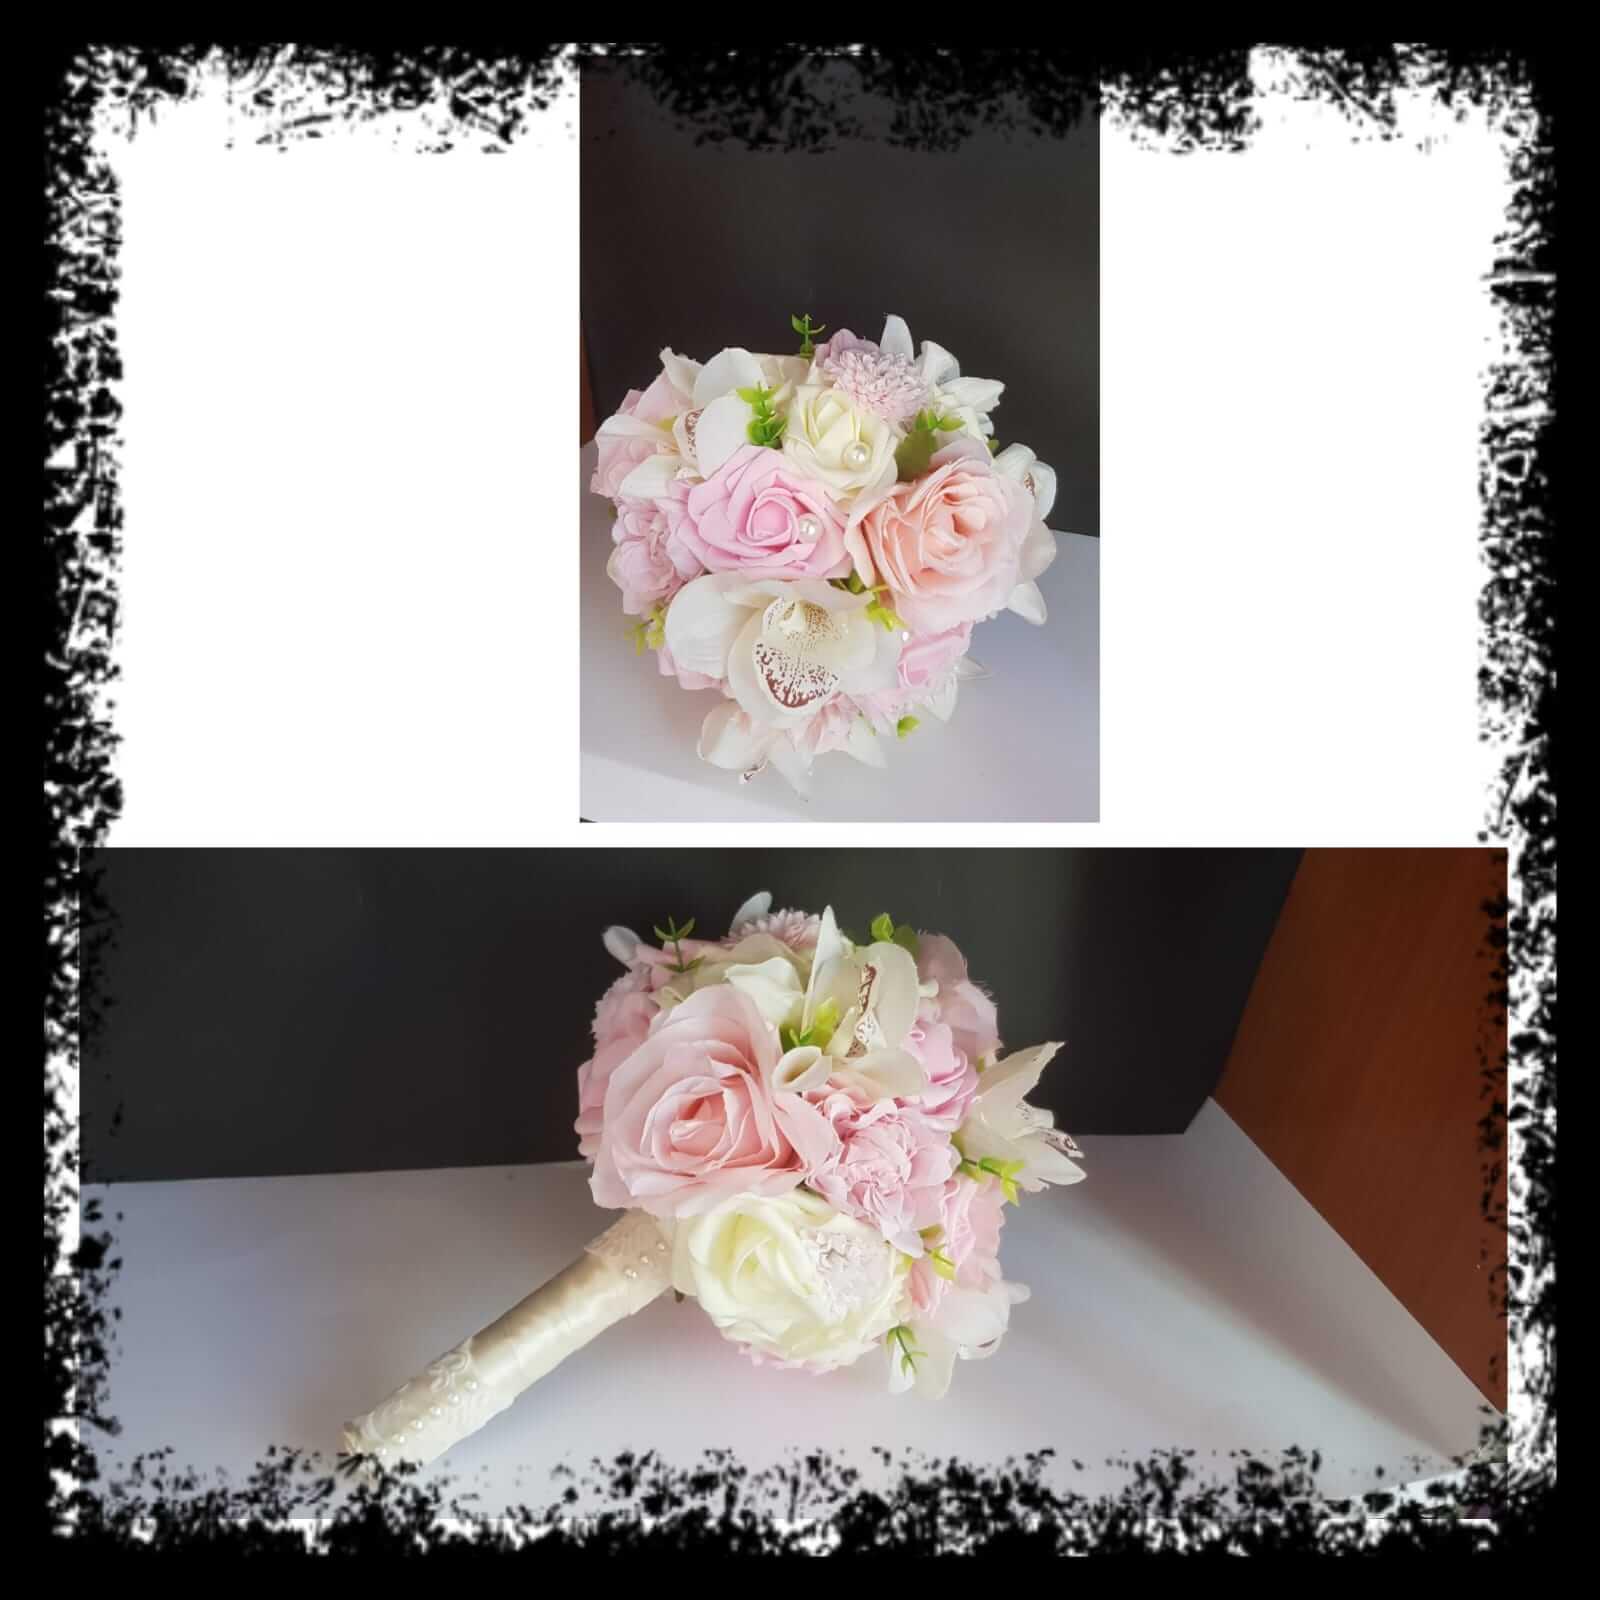 ramo de novia ramo de novia - ramos novia 6 - Ramo de novia